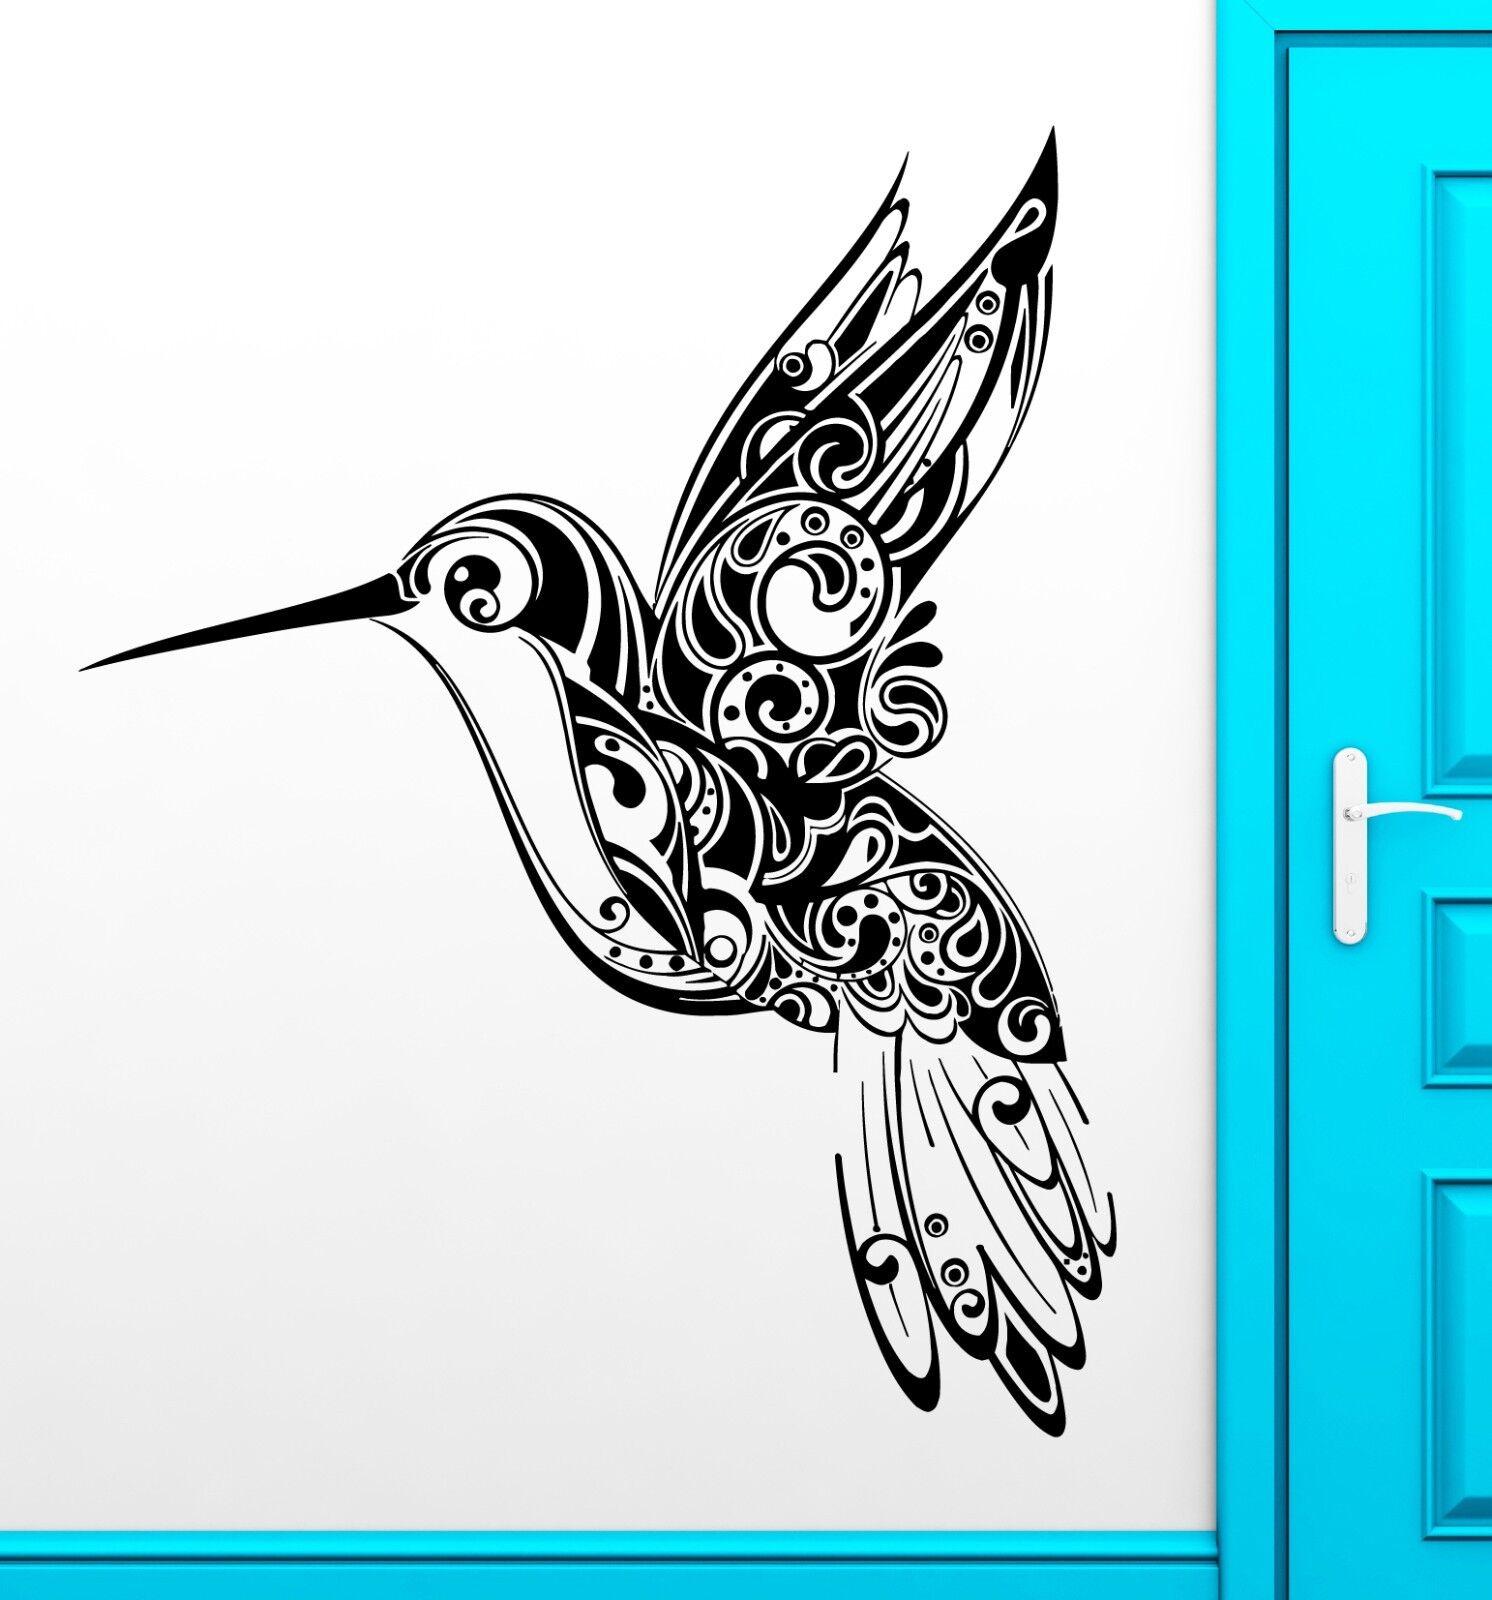 ig111 Wall Stickers Heron Marsh Nature Animals Bird Art Mural Vinyl Decal